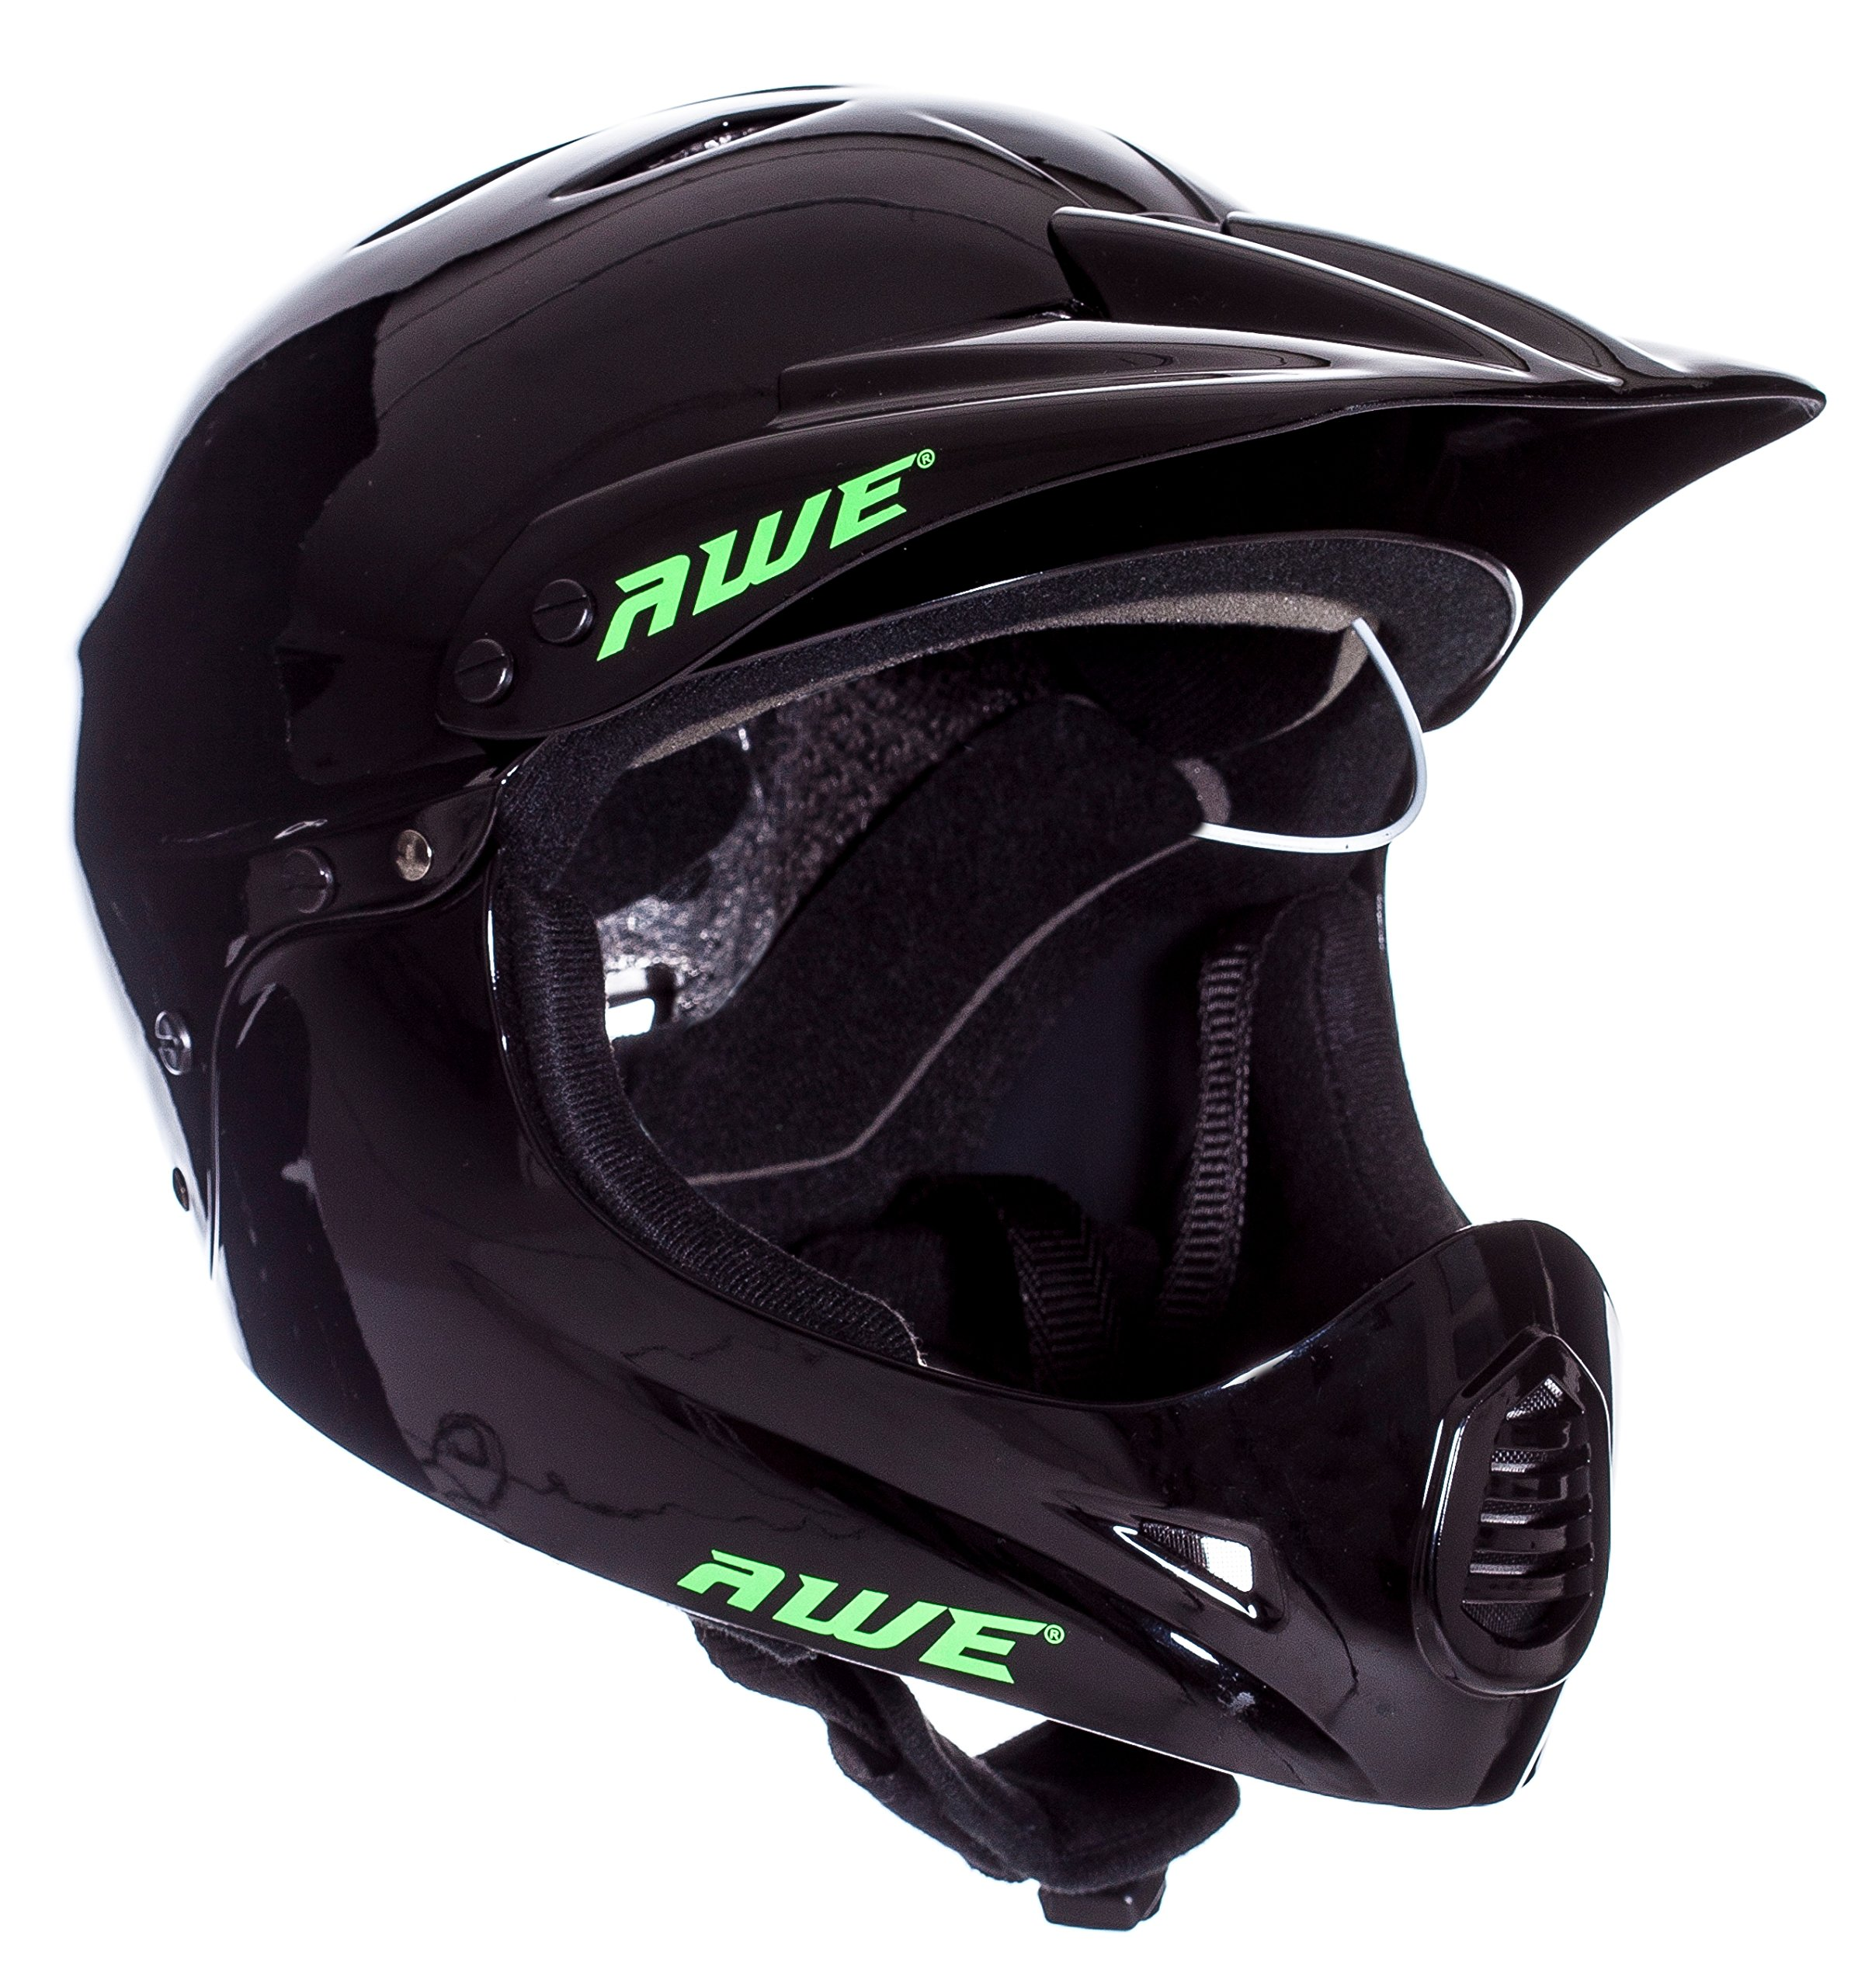 AWE FREE 5 YEAR CRASH REPLACEMENT Full Face Helmet Black Medium